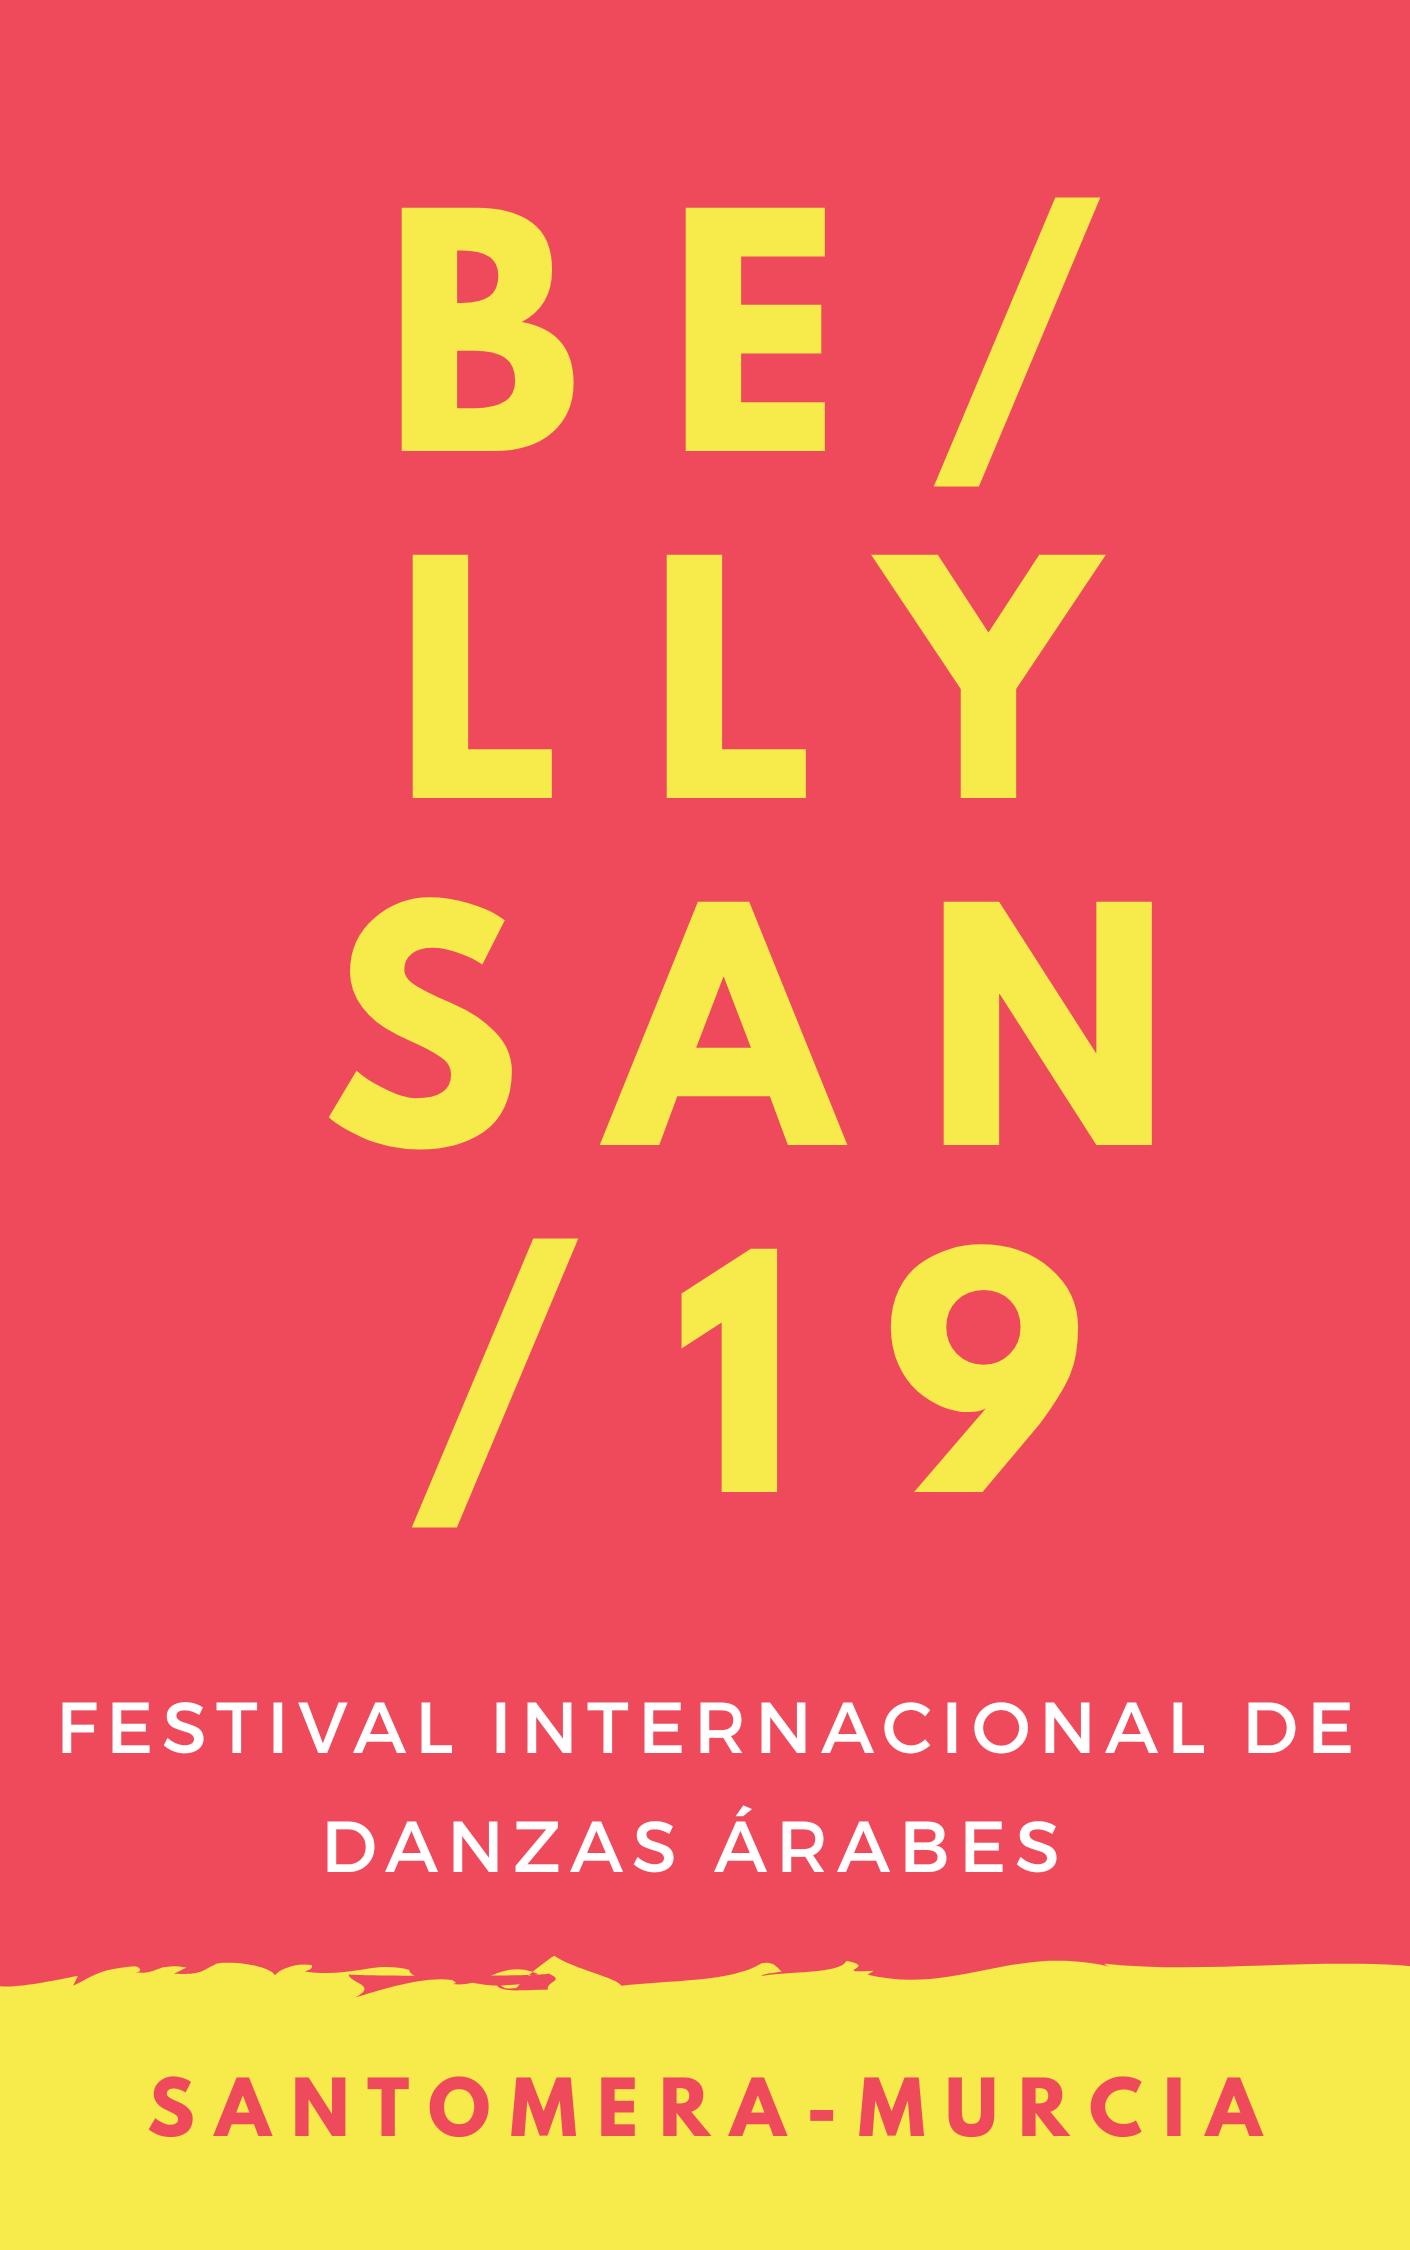 bellysan 2019